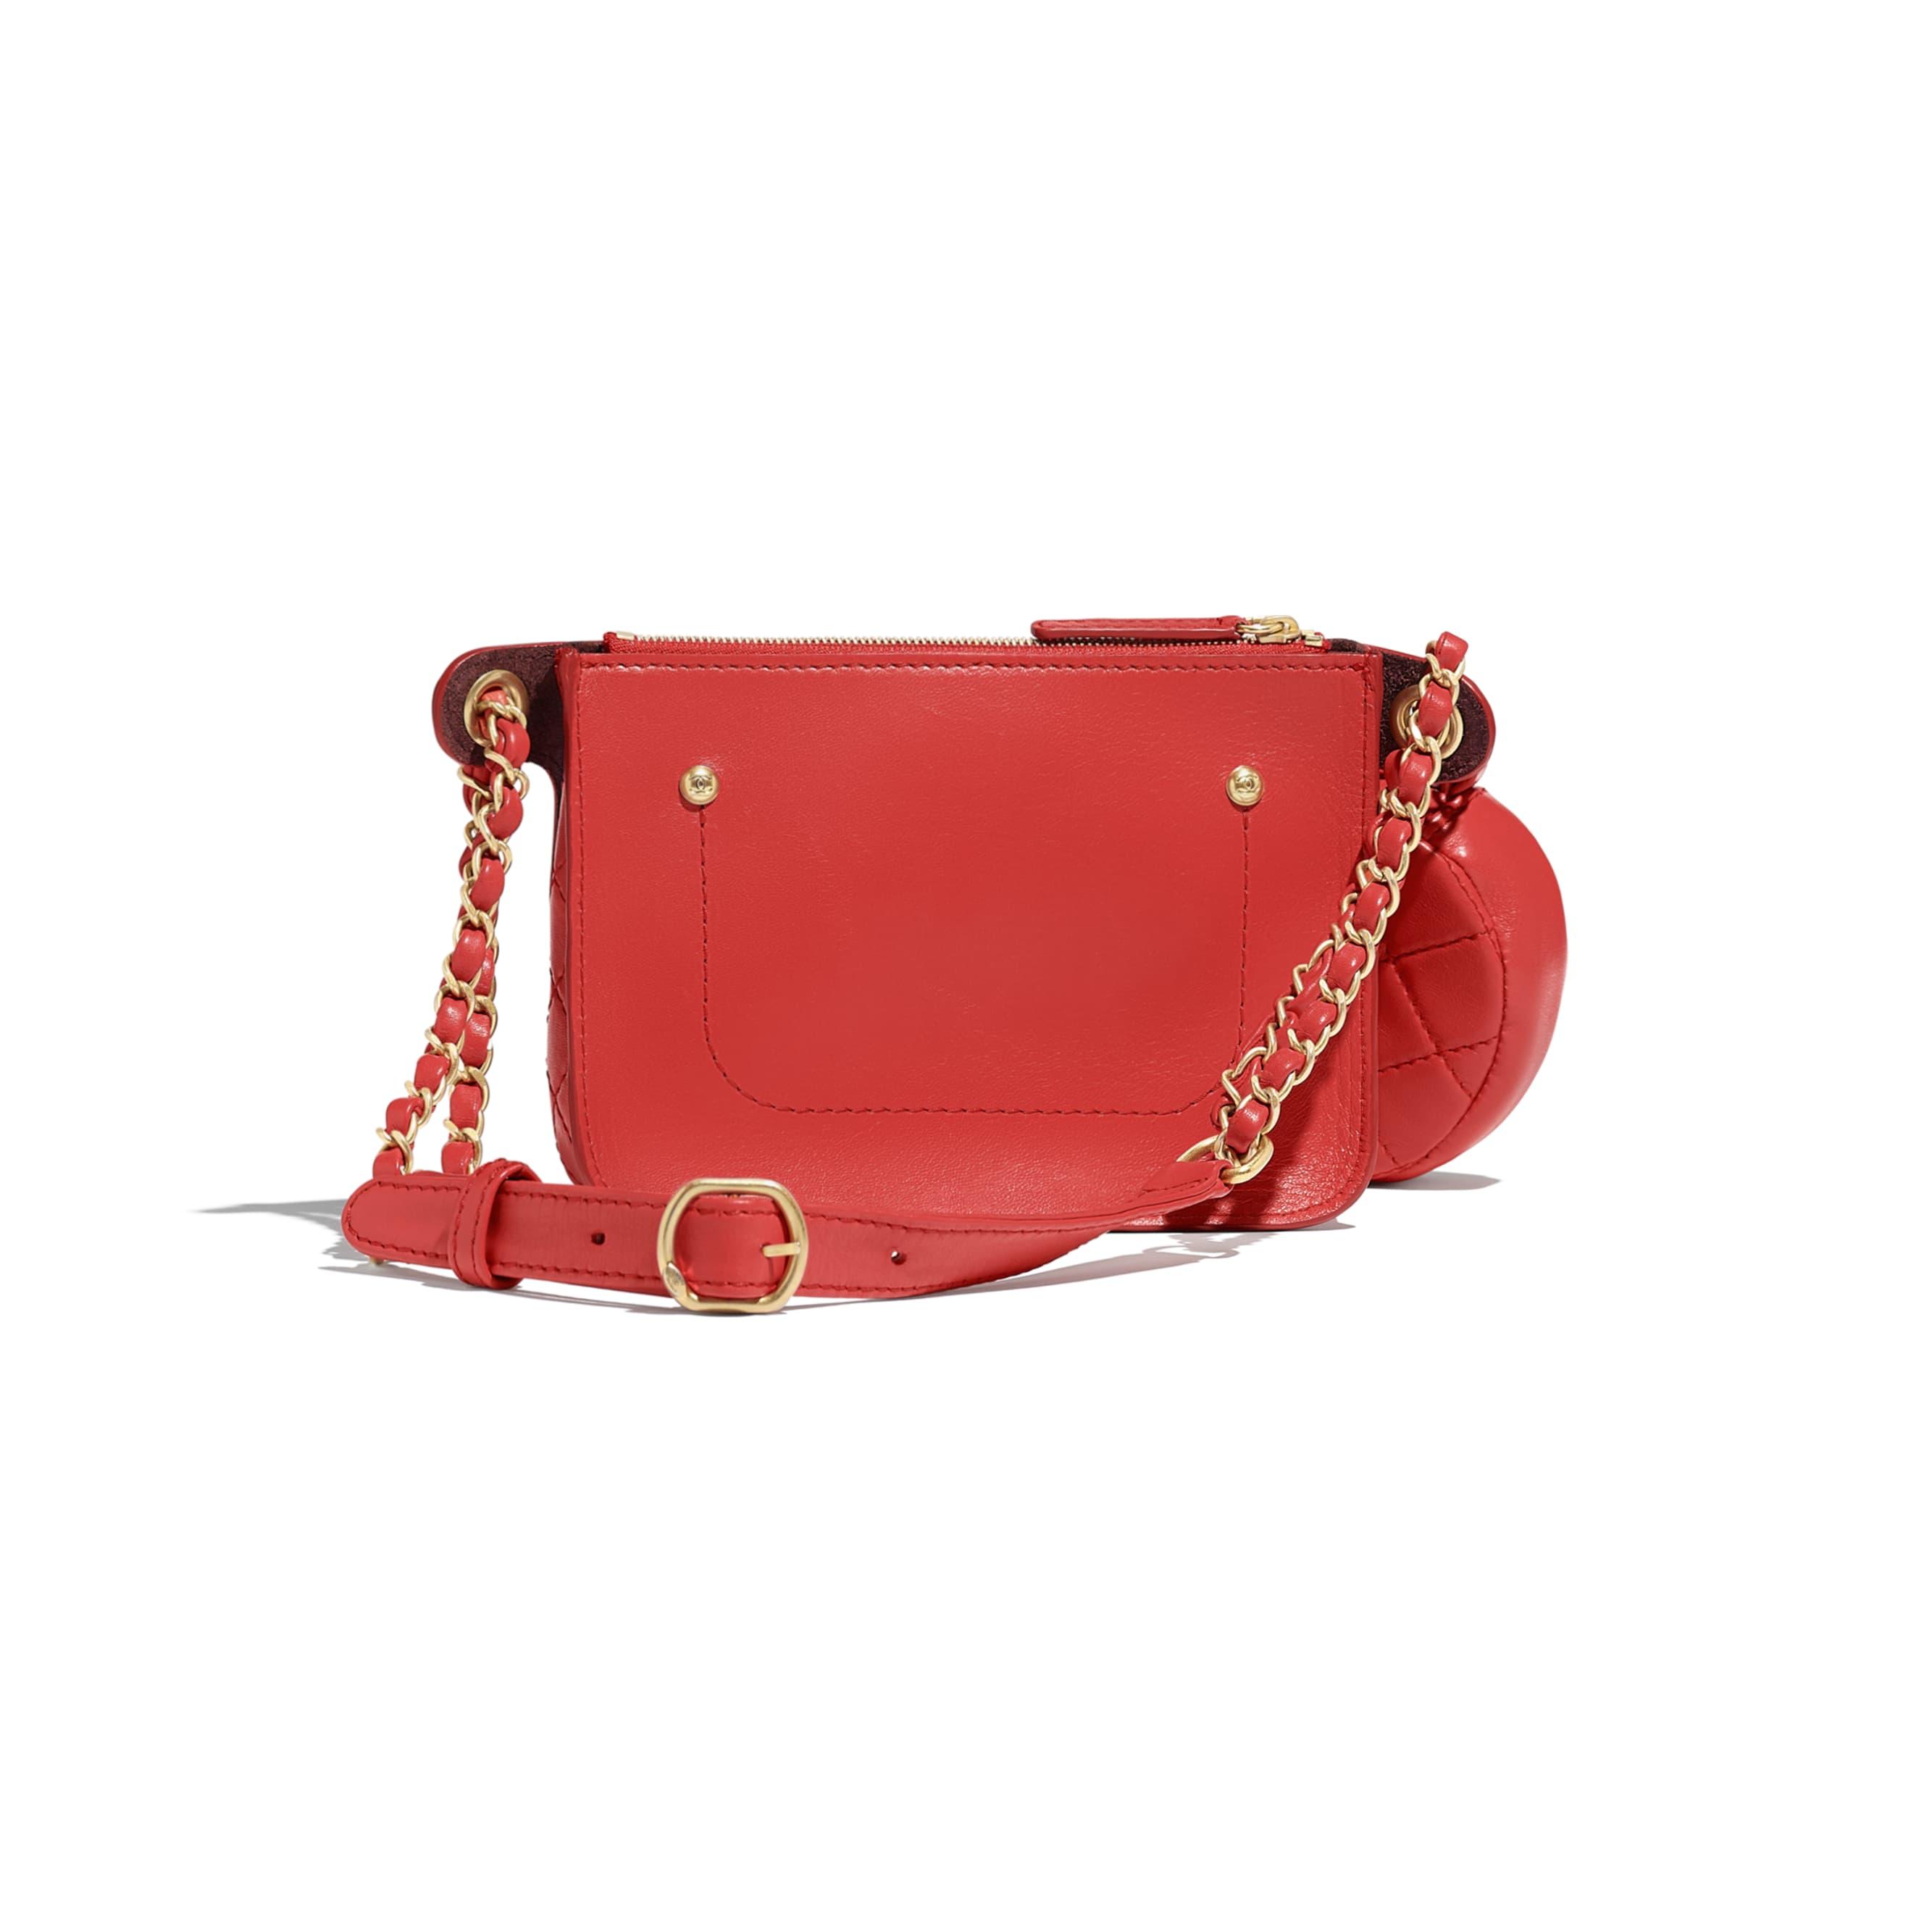 Waist Bag & Coin Purses - Red - Calfskin, Wool Tweed & Gold-Tone Metal - Alternative view - see standard sized version